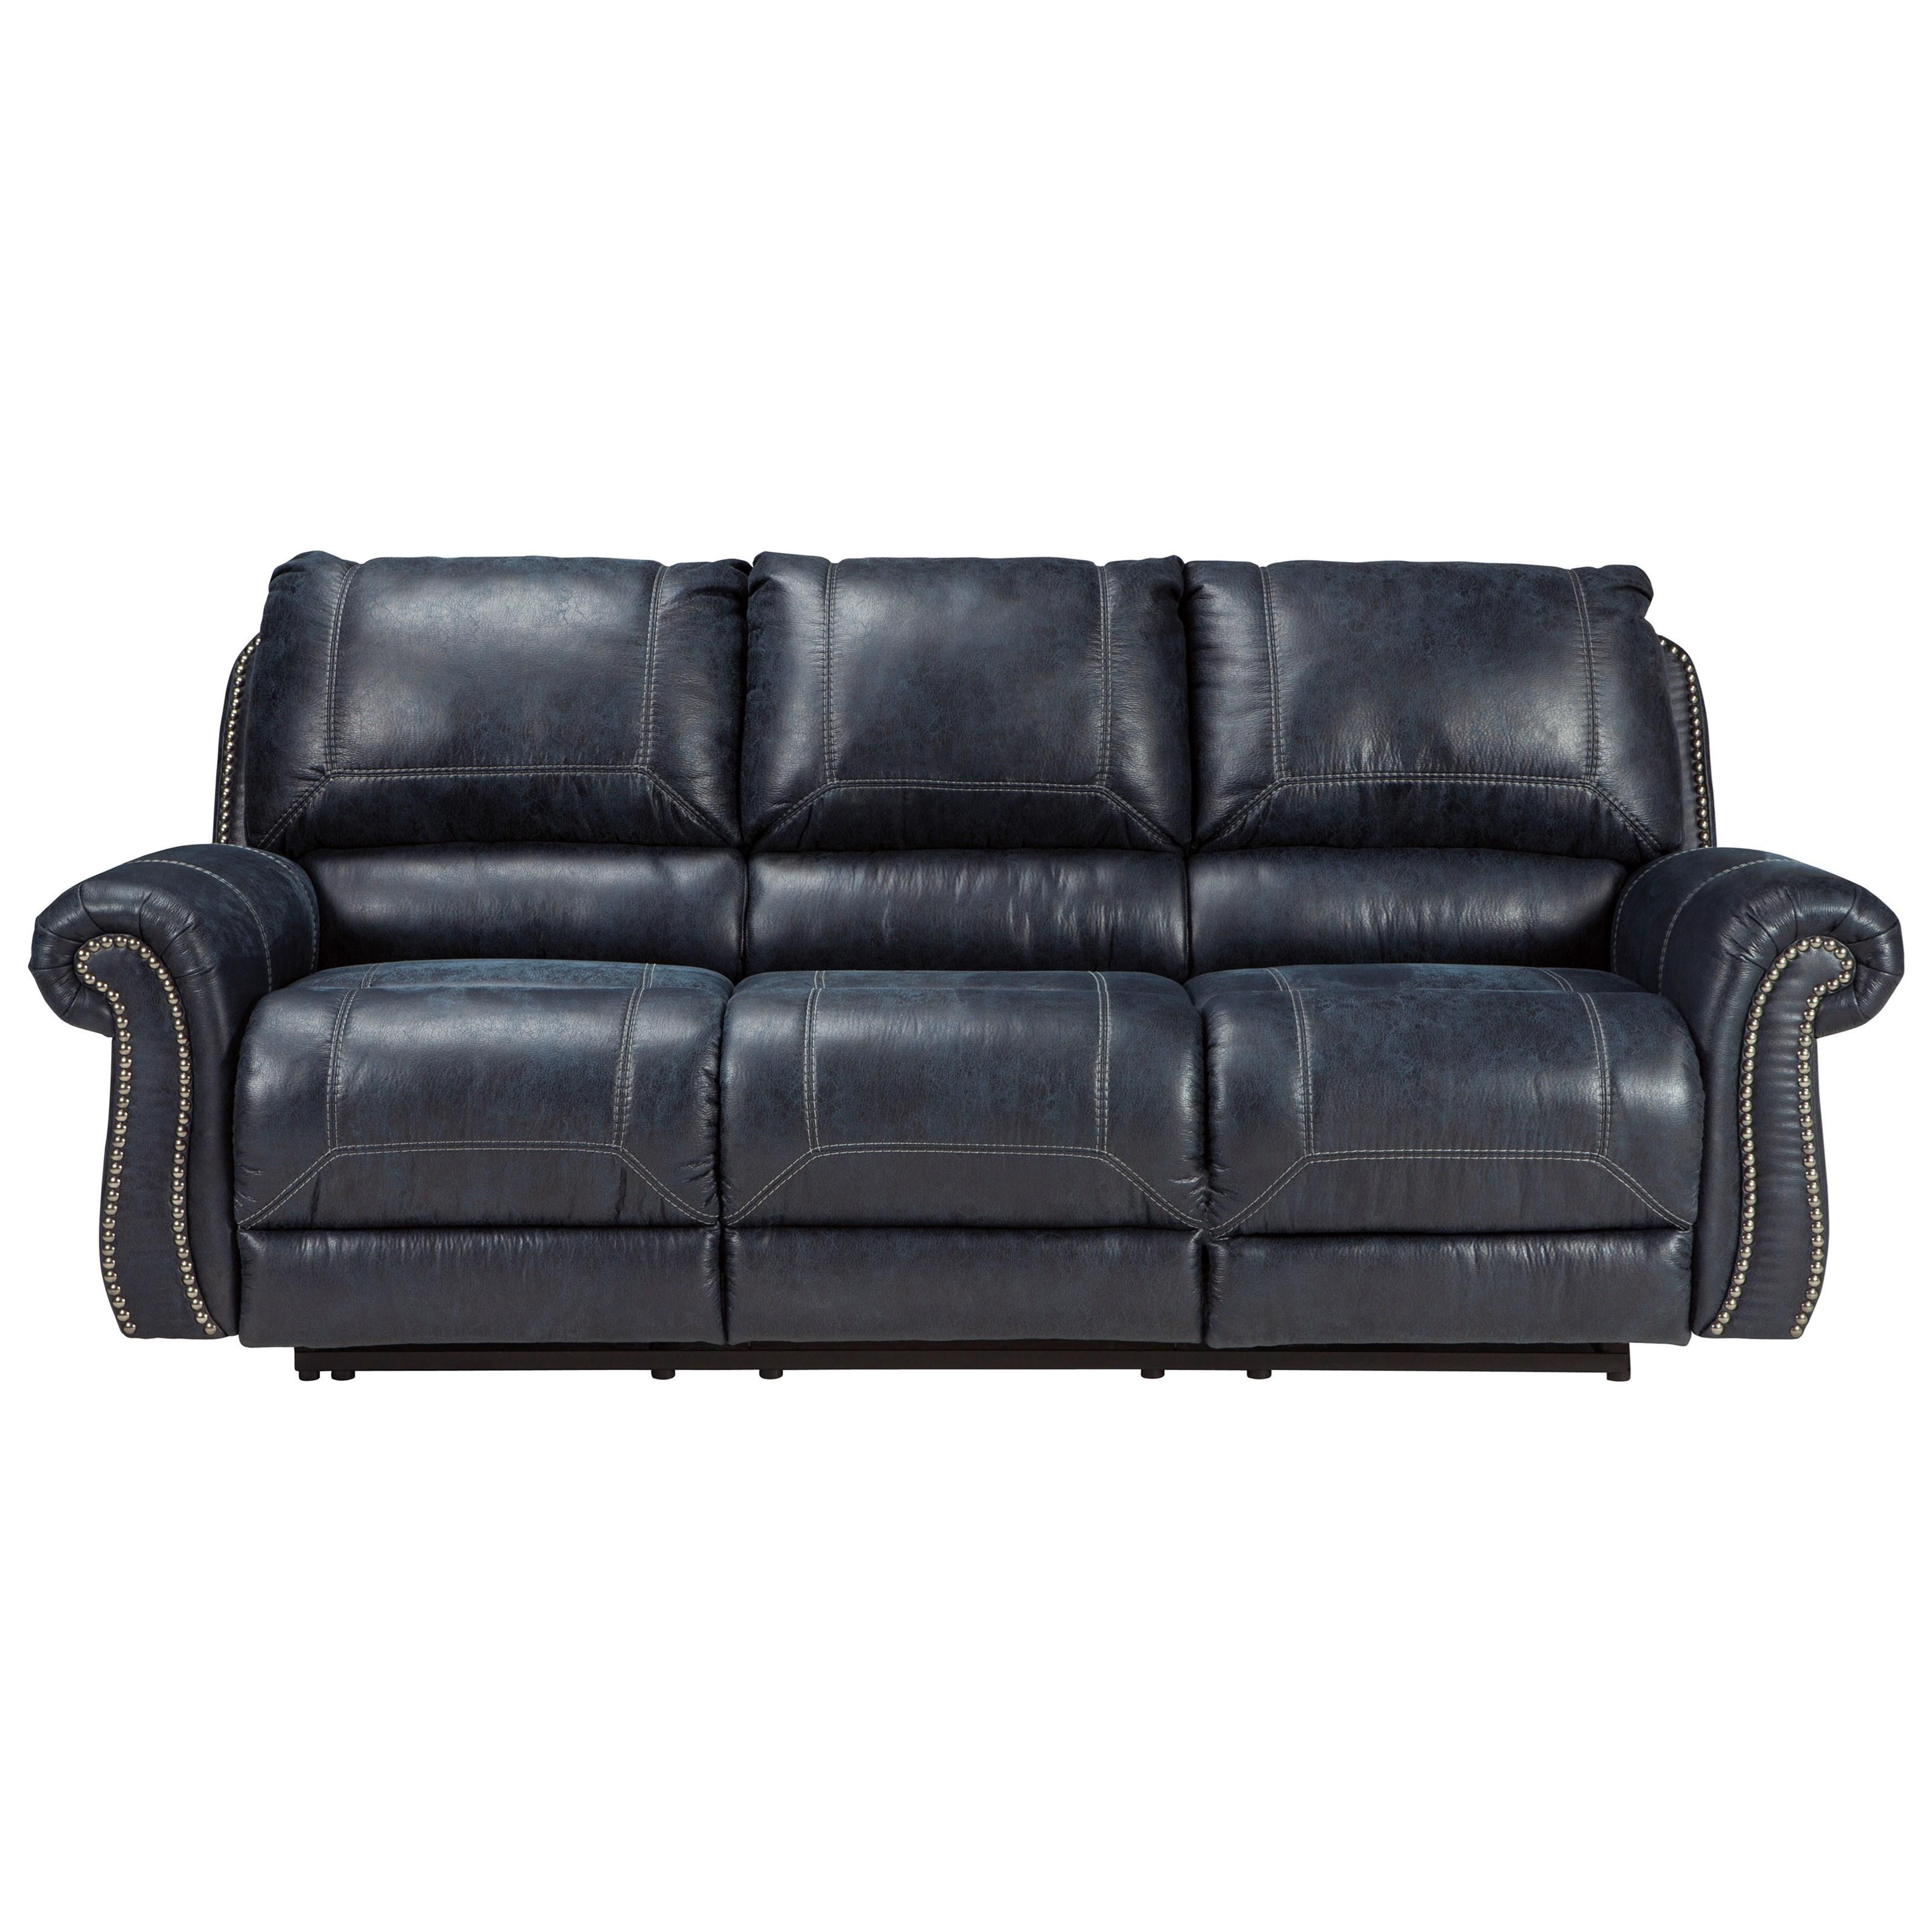 Trendz Molly Reclining Power Sofa - Item Number: 6330487